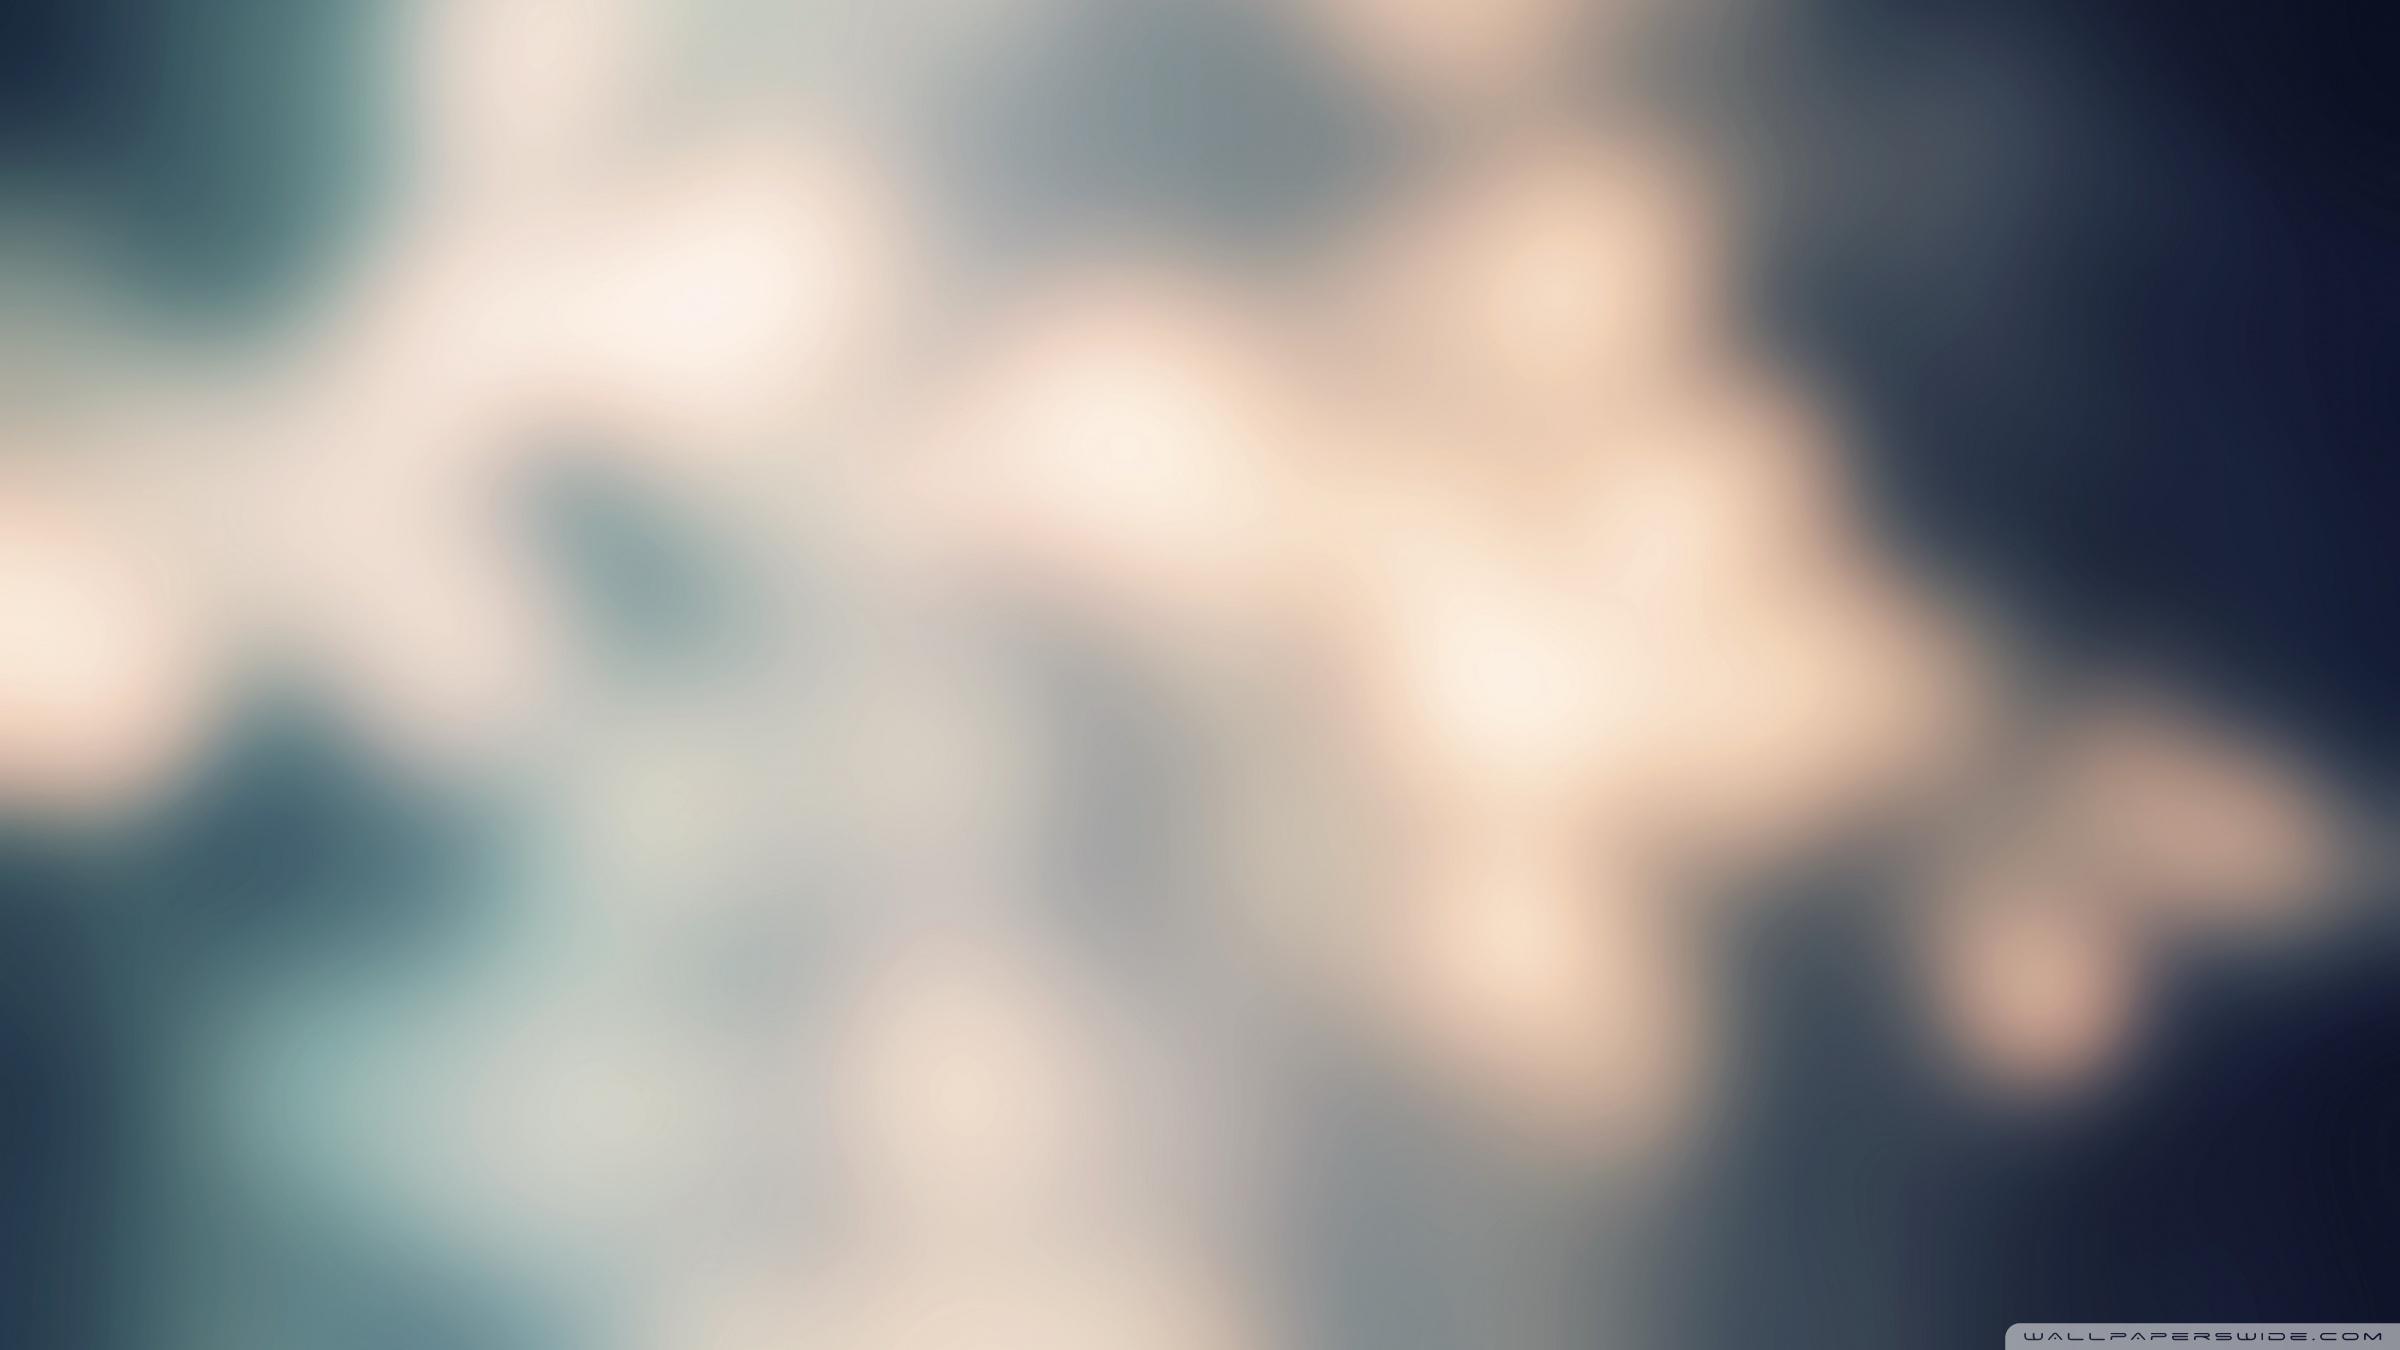 Blurry Anime Wallpaper Background 2400x1350 Wallpaper Teahub Io